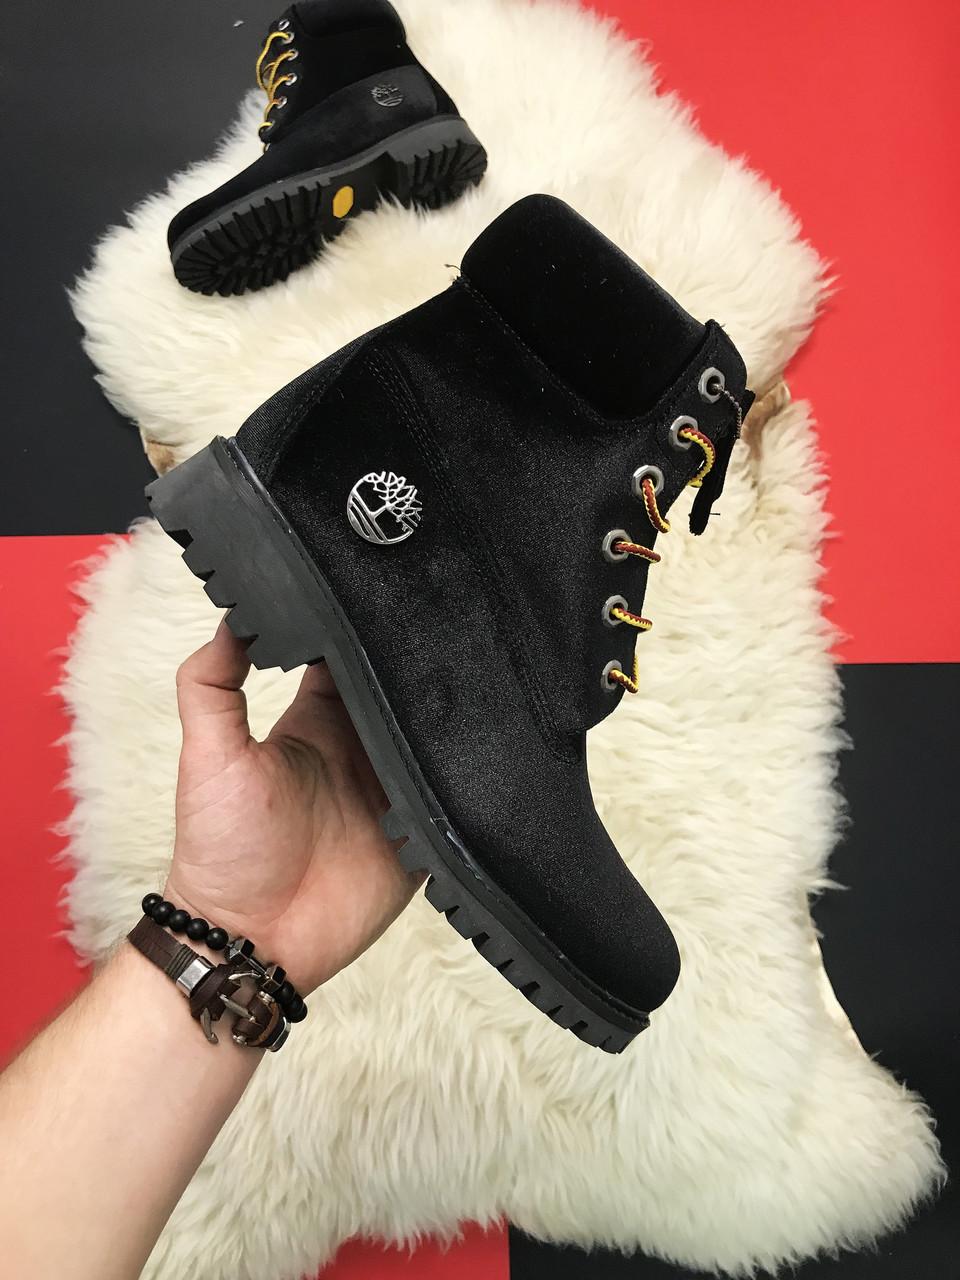 Жіночі черевики Timberland Black Velvet x Off White, Репліка